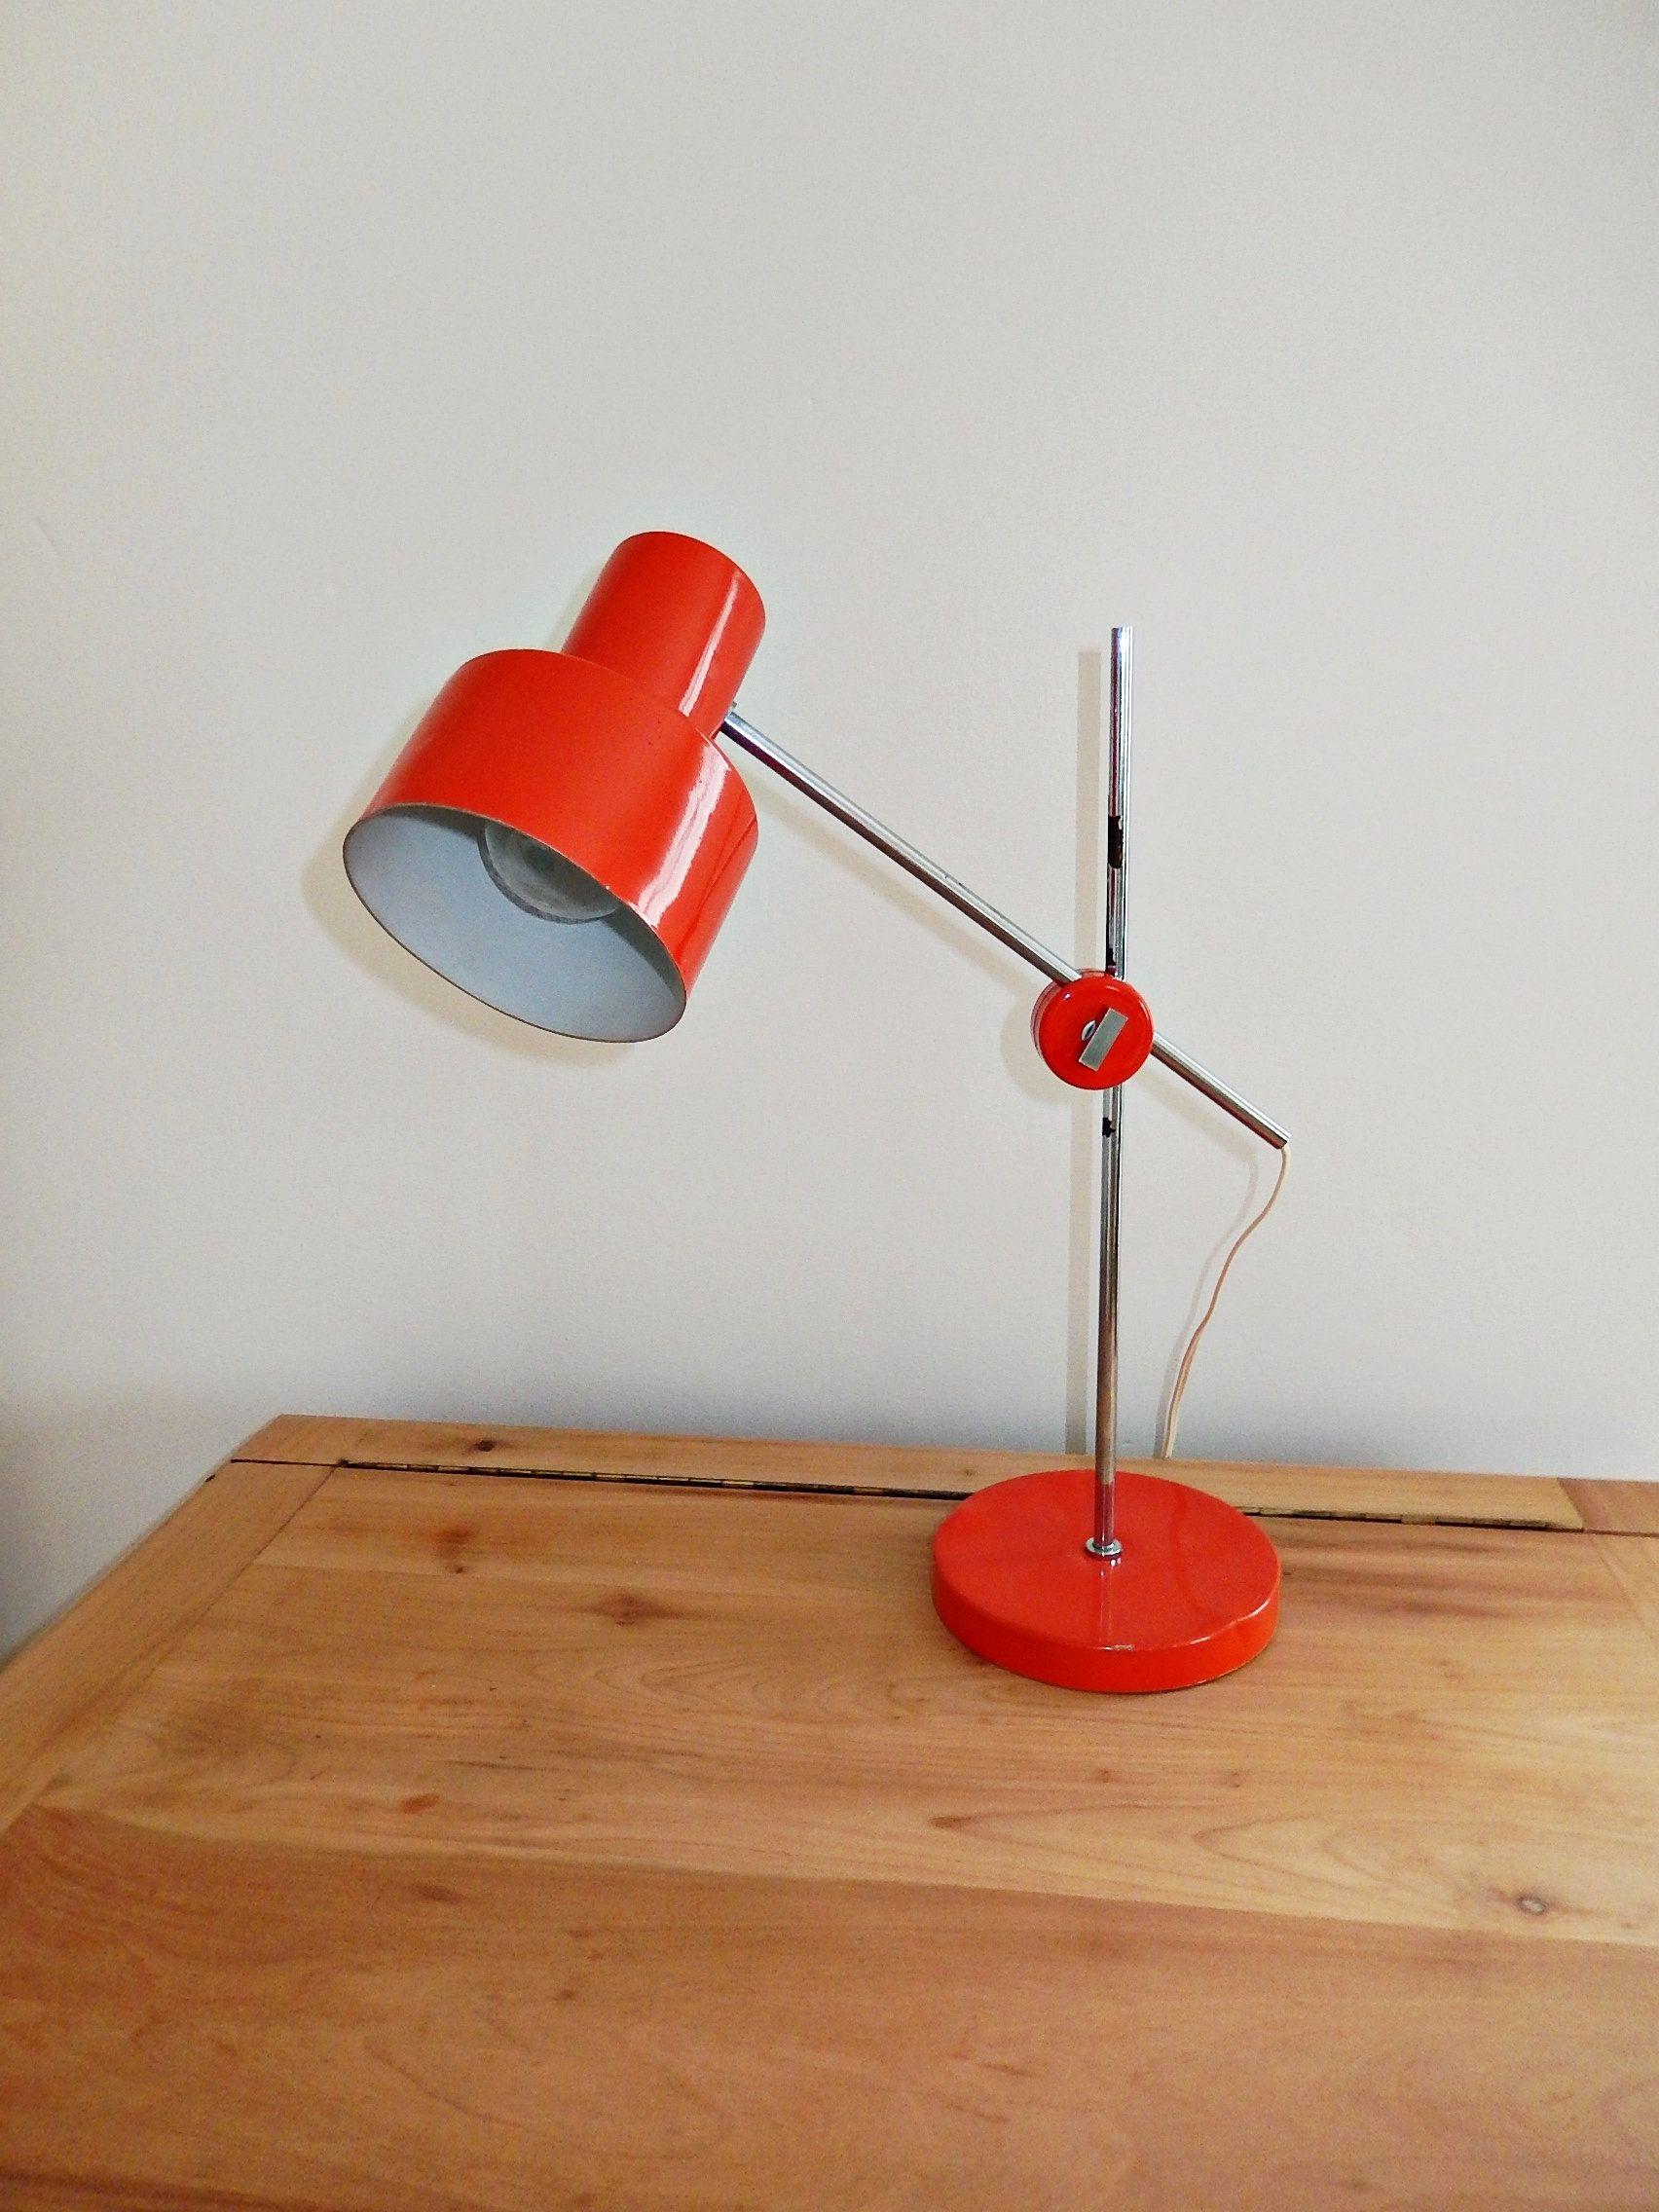 Lampe Jan Suchan Elektrosvit Orange Lampe De Bureau Industrielle Vintage Annees 1960 In 2020 Vintage Decor Desk Lamp Lamp